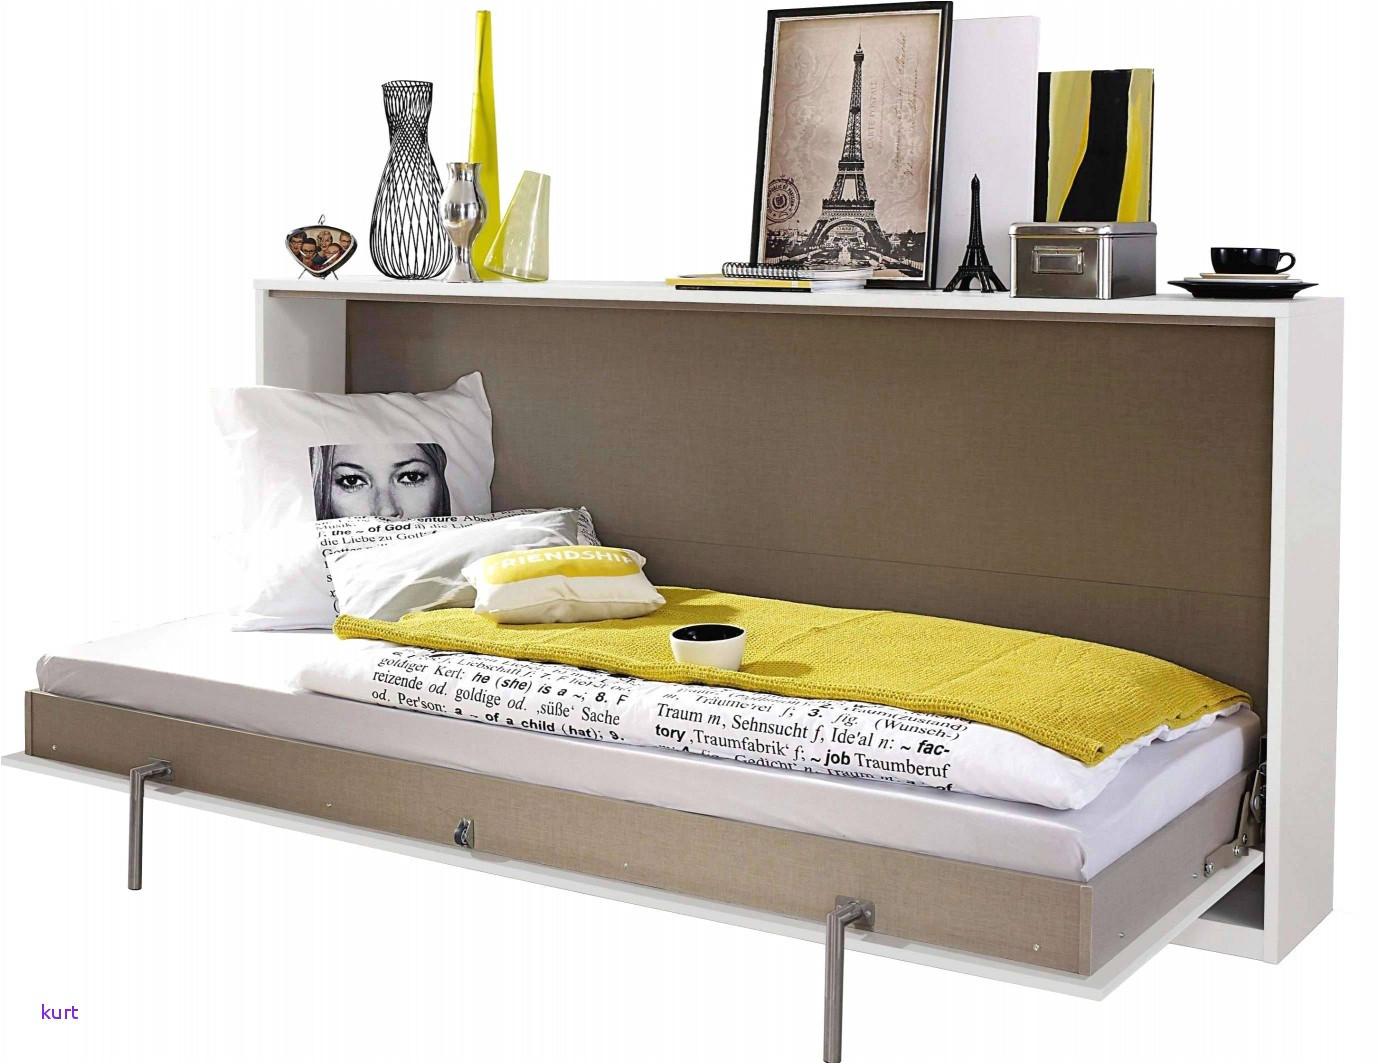 ikea schlafsofas beste ikea sofa bed fascinante ikea outdoor furniture beautiful wicker bilder of 29 elegant